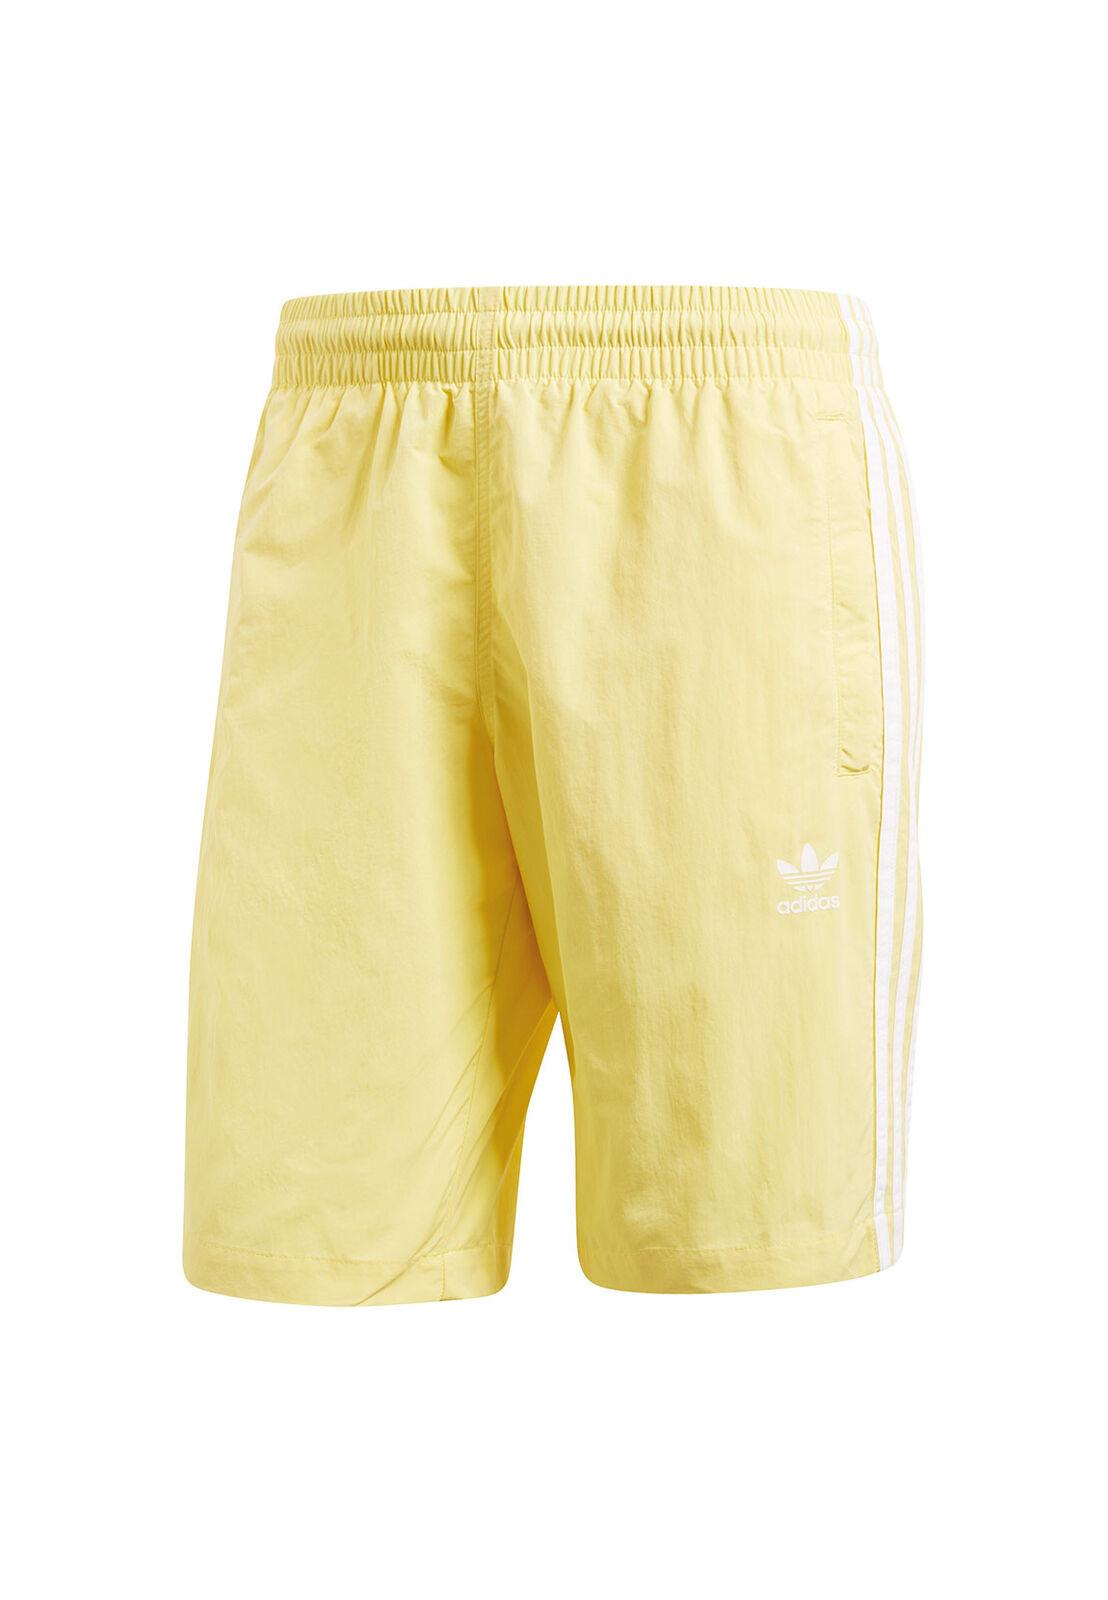 Adidas Originals Men's Bathing Trunks 3 Stripes Swim cw1307 Yellow